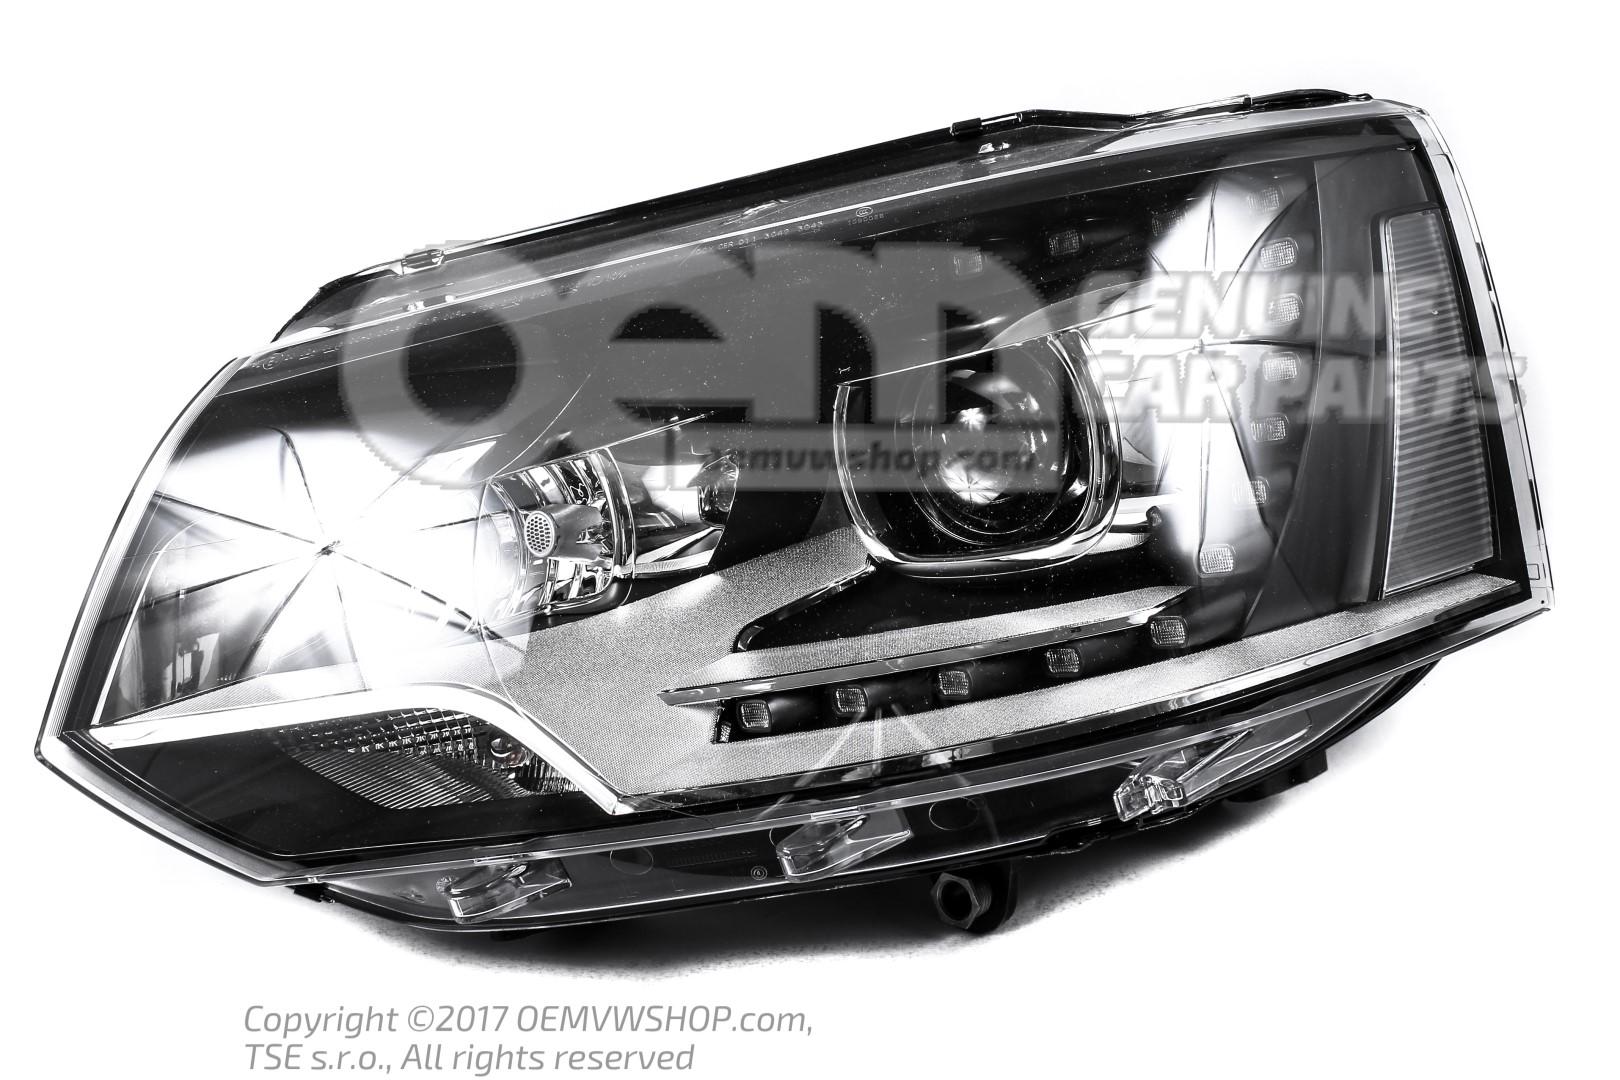 Gas discharge headlight 7E5941017 | oemVWshop com